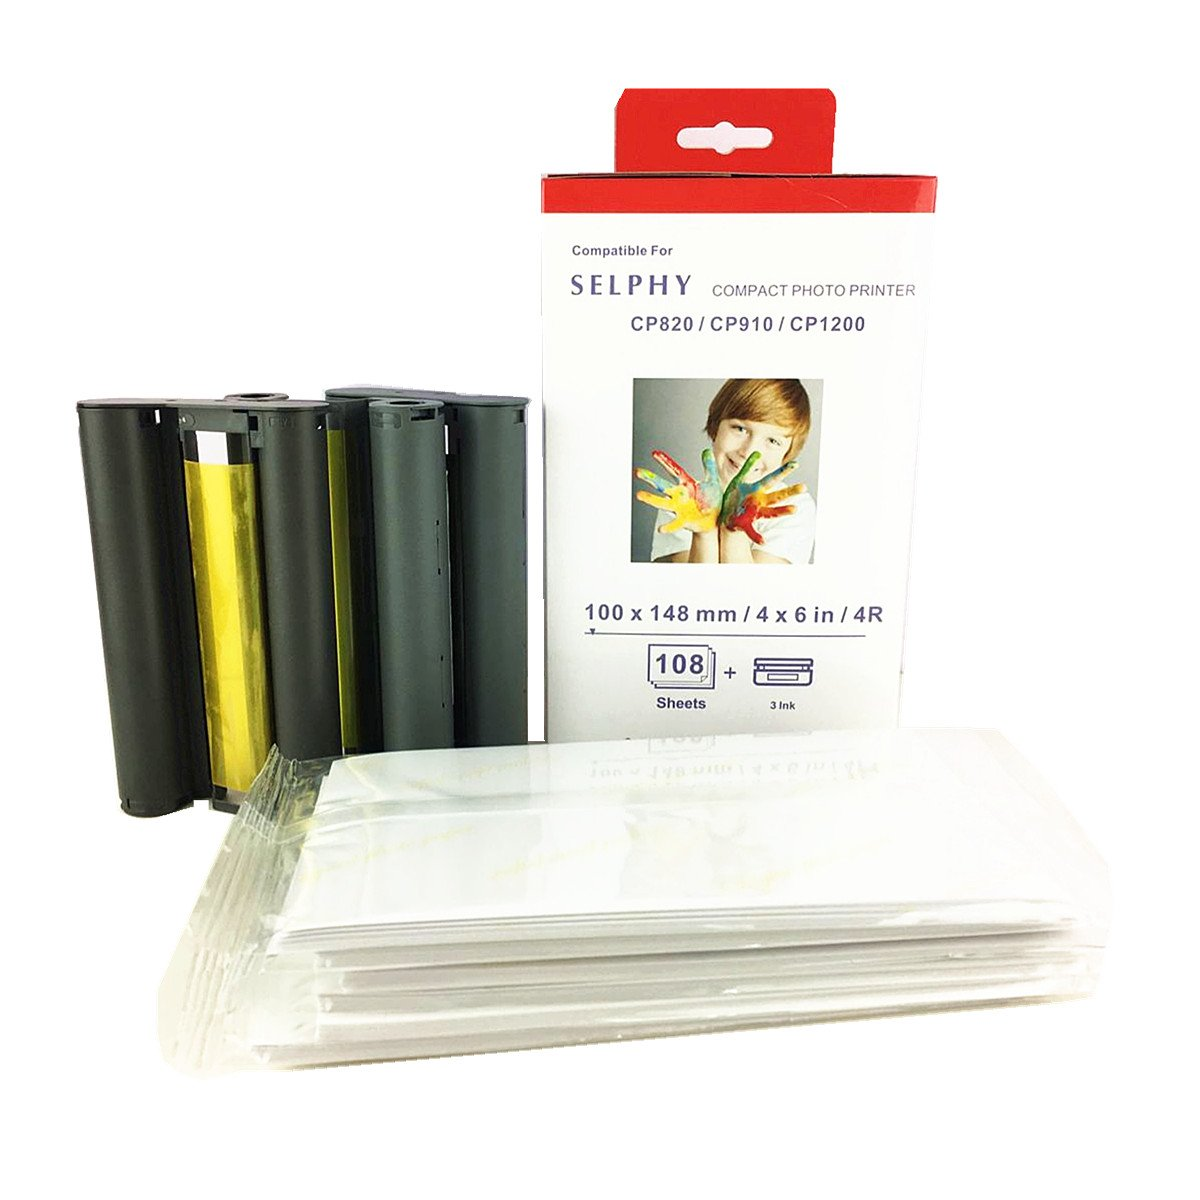 KP-108IN Color Ink/Paper Set (108 Sheets & 3 Ink) Compatible with SELPHY CP1300 CP800 CP810 CP820 CP900 CP910 CP1200 ES1 ES2 CP200 CP1000 Printer KP-108IP by HEMEINY